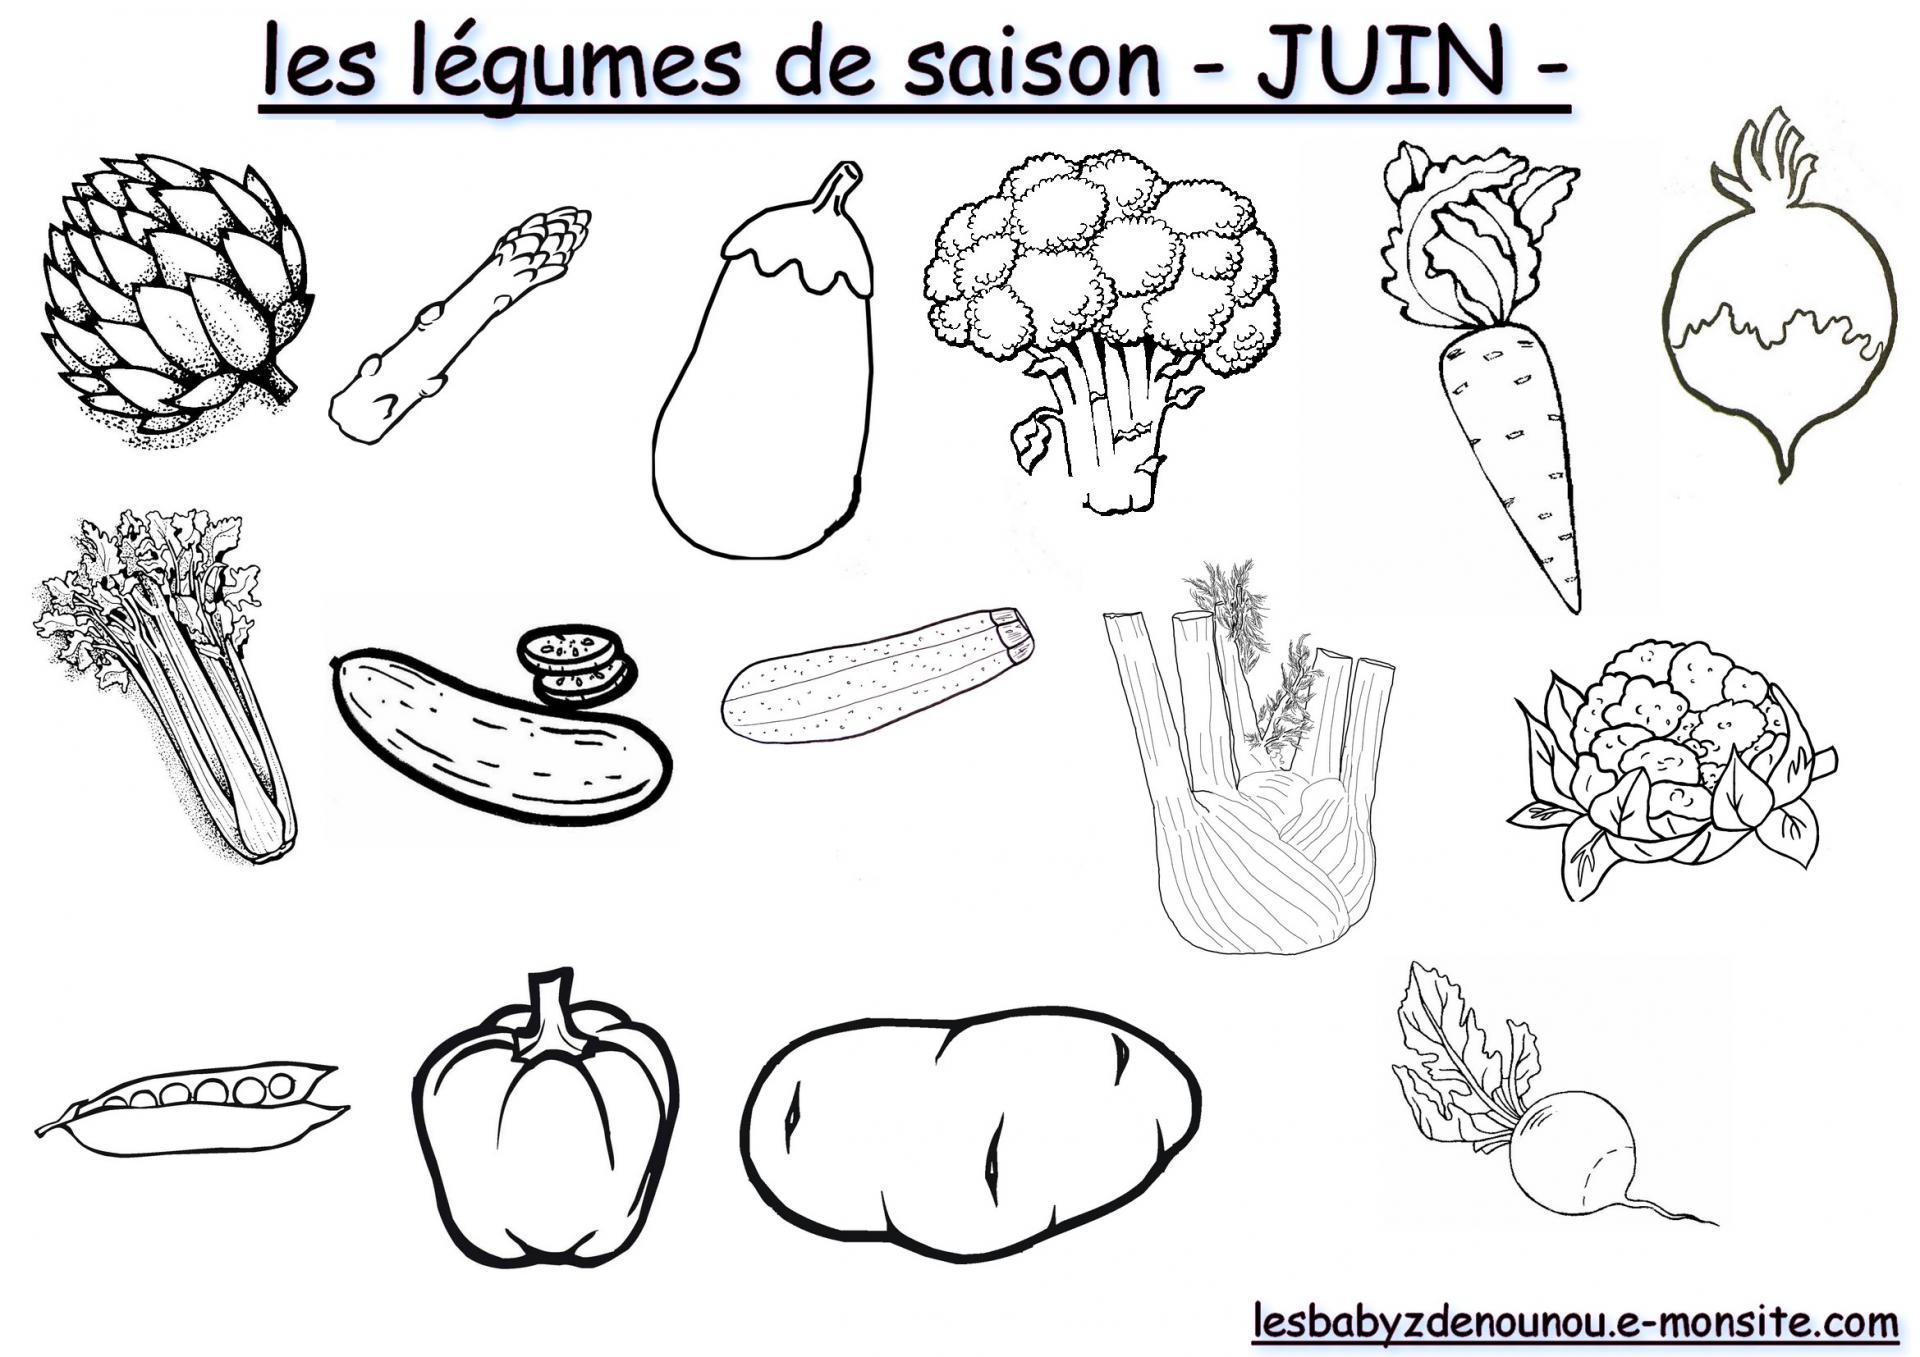 Les legumes juin